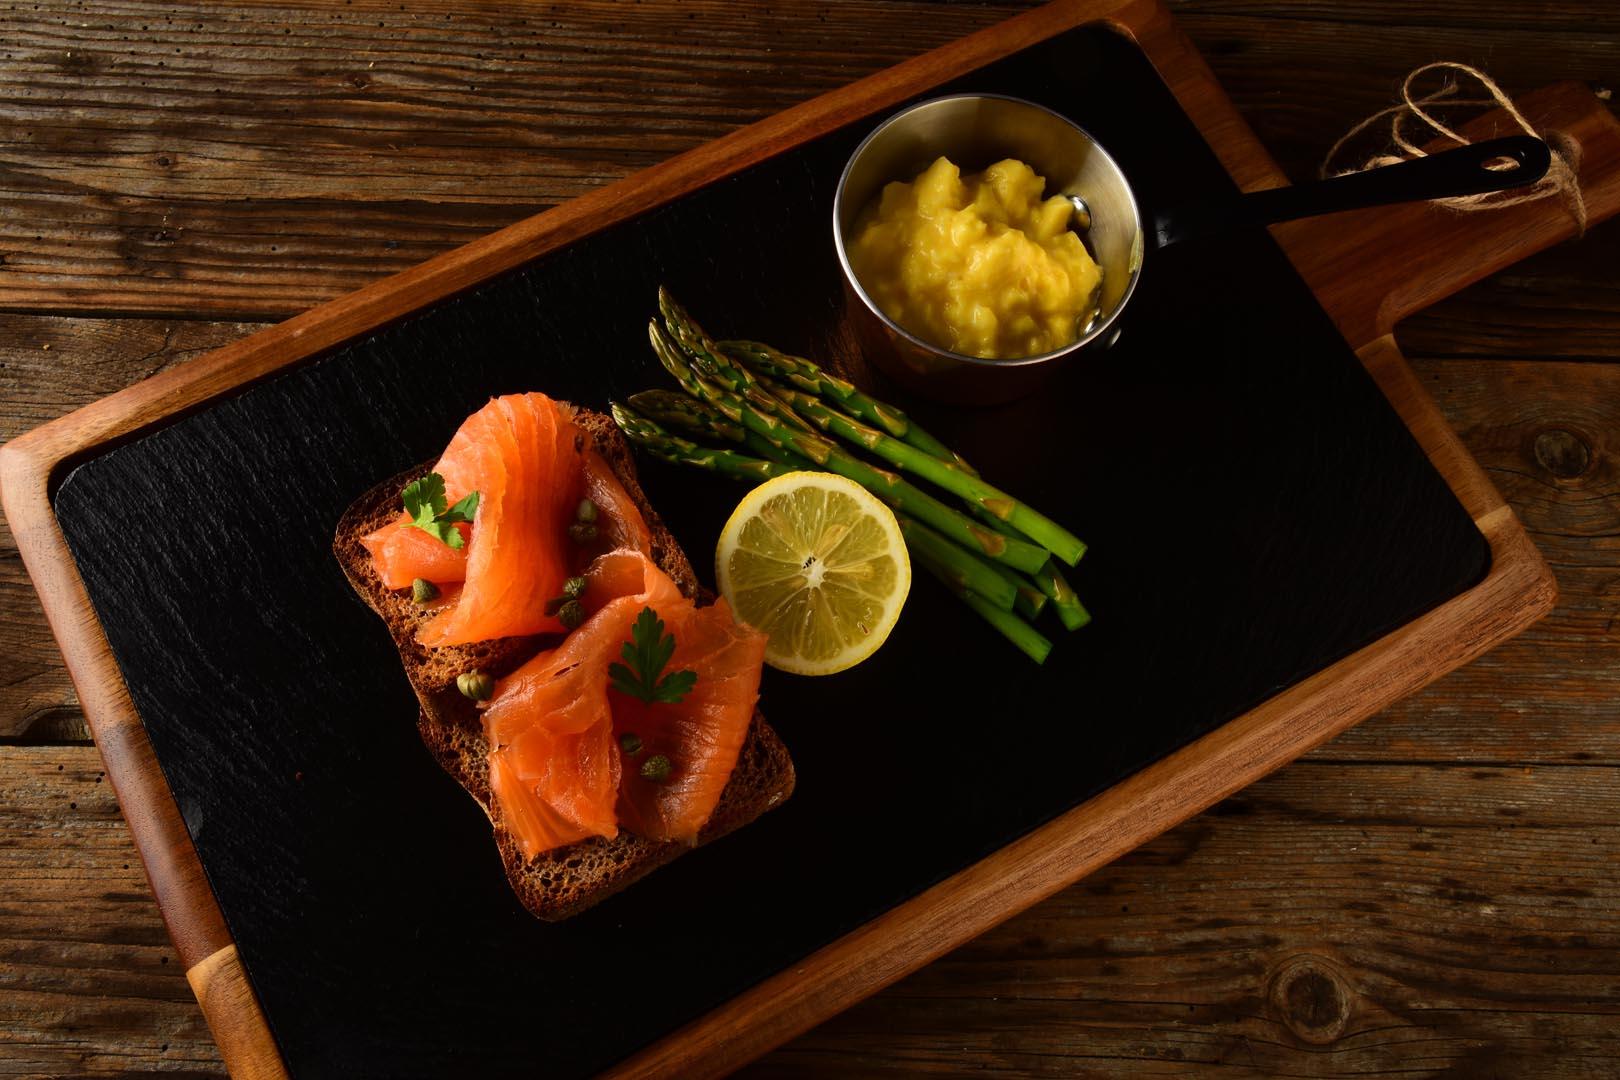 Smoked salmon plated